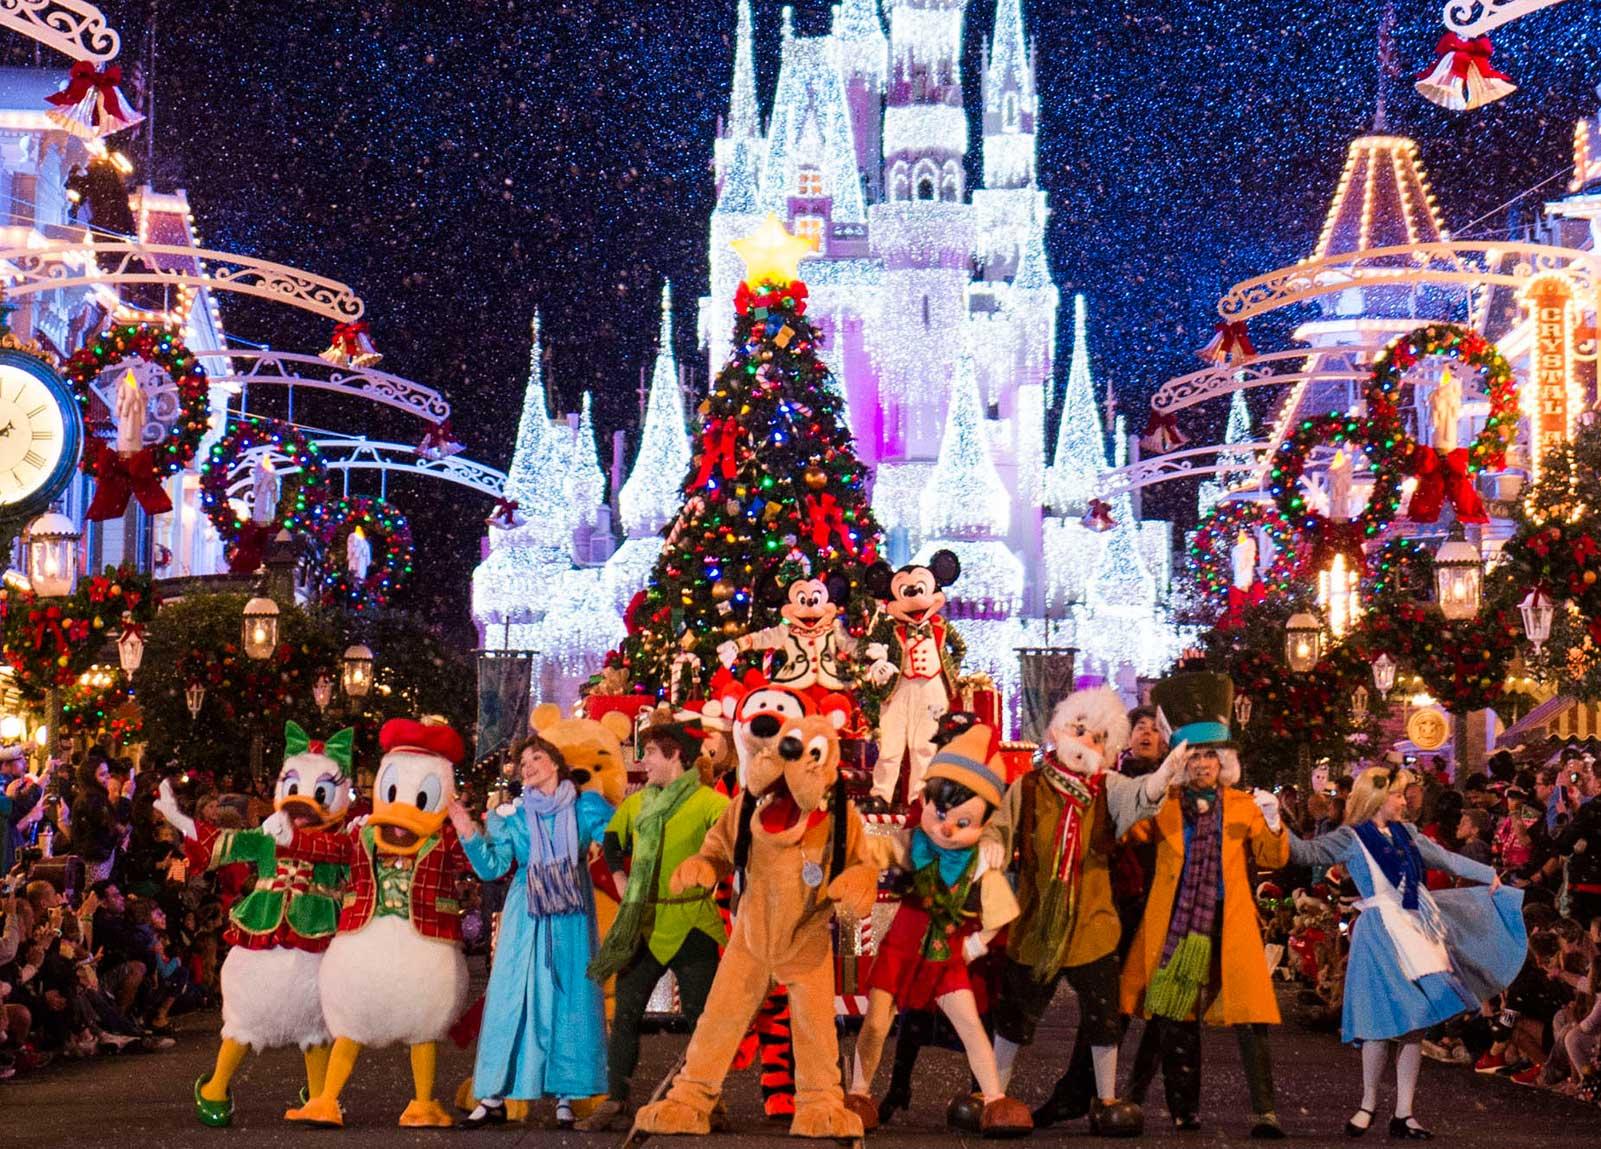 Central Park Fall Desktop Wallpaper Disney Christmas Vacation Christmas At Disneyland 2019